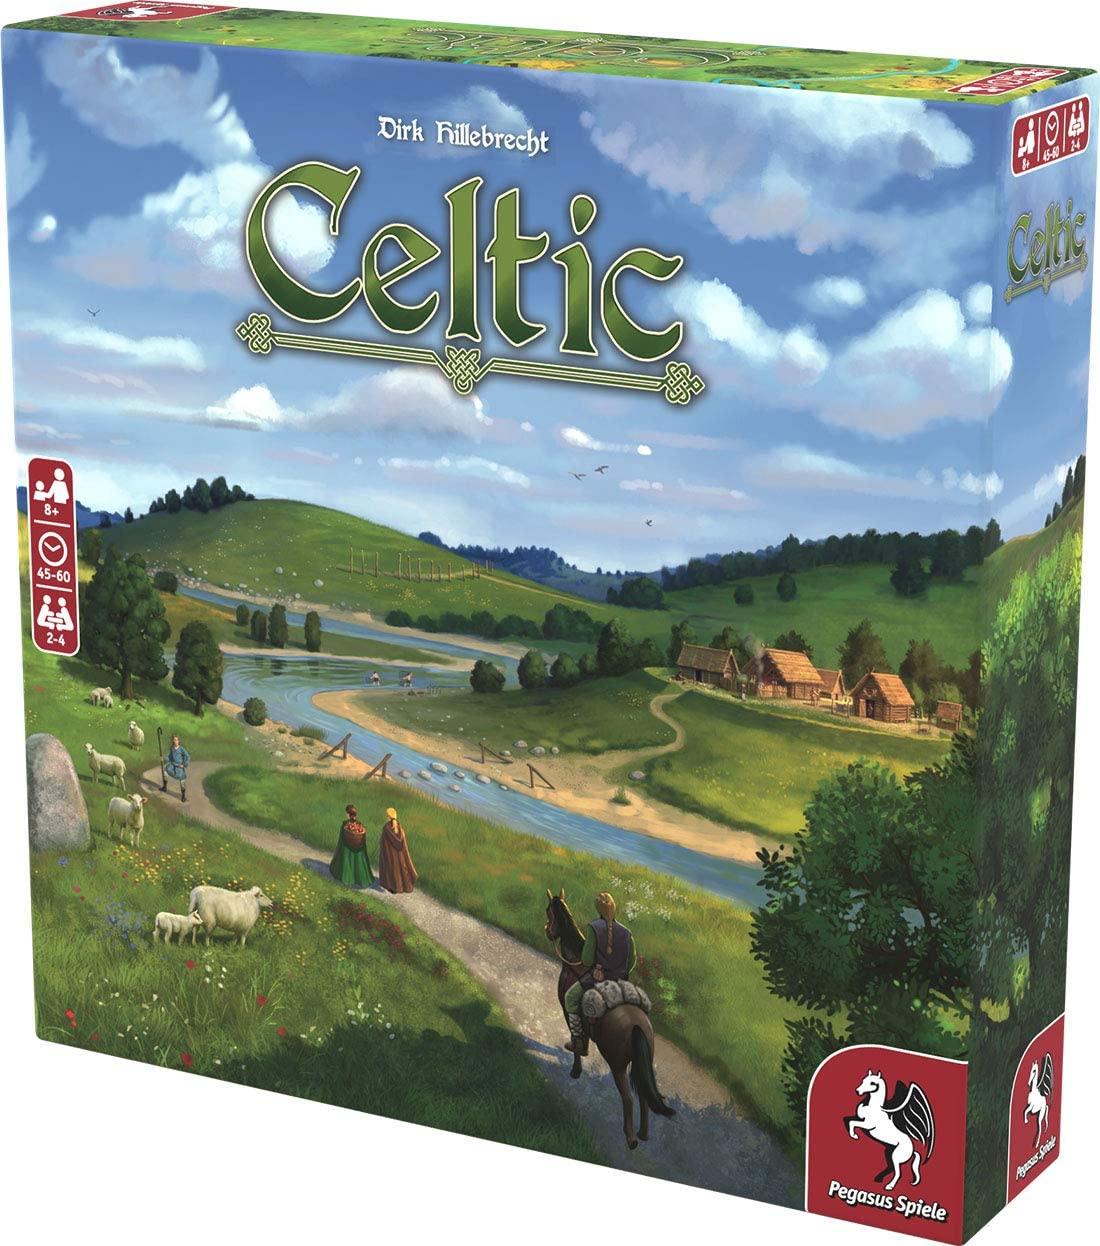 Celtic Bild